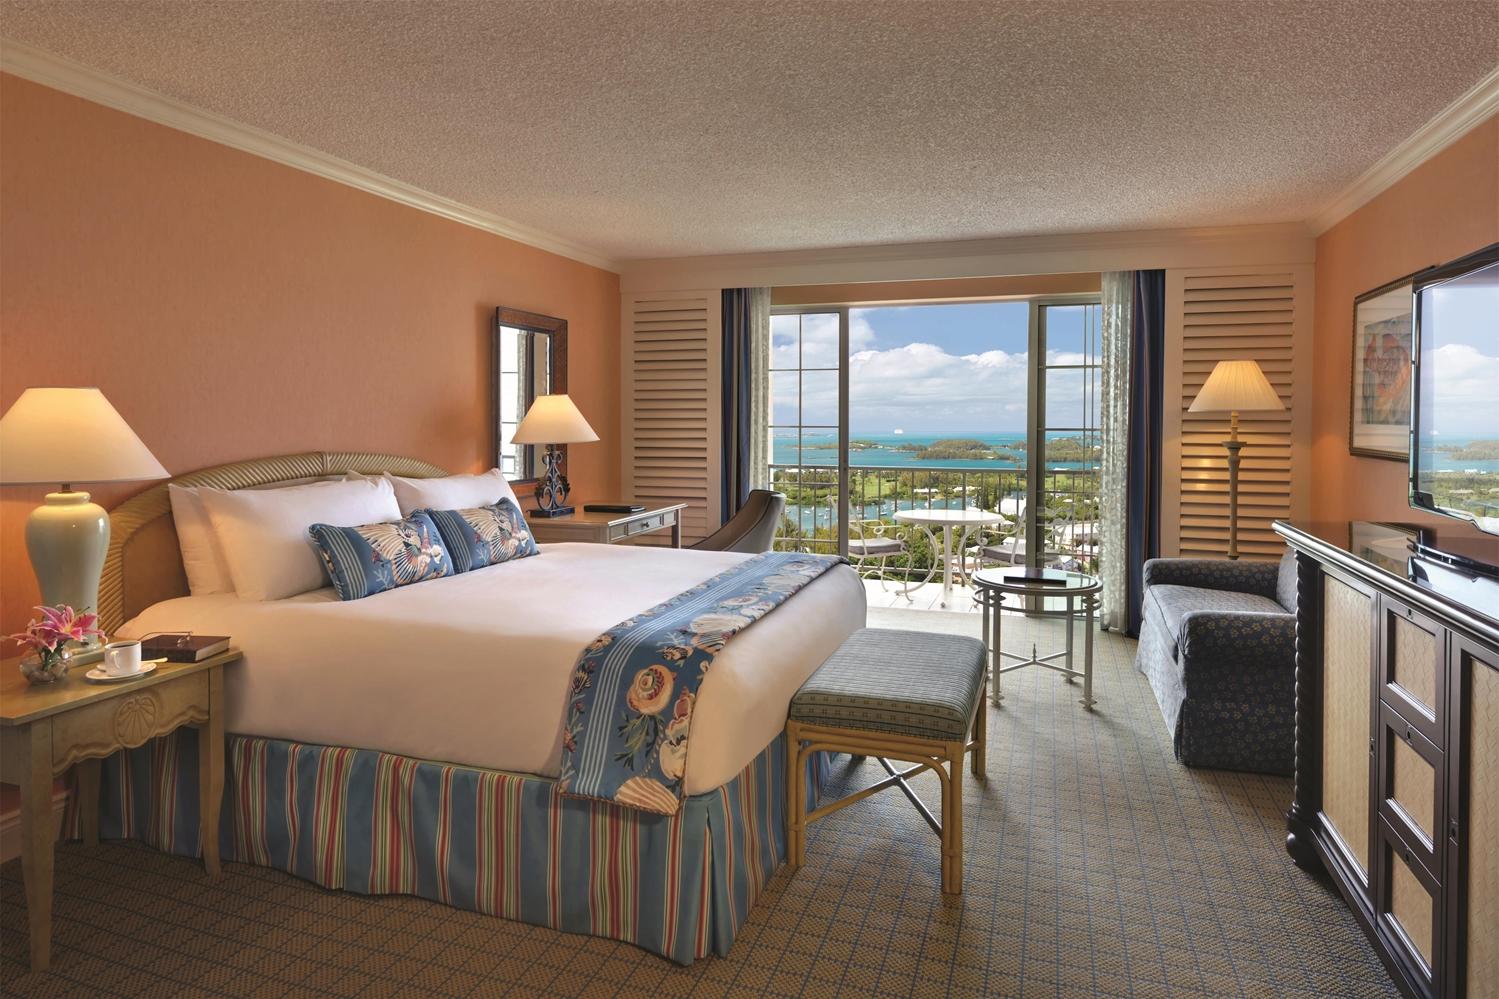 Fairmont Gold Sea View Room